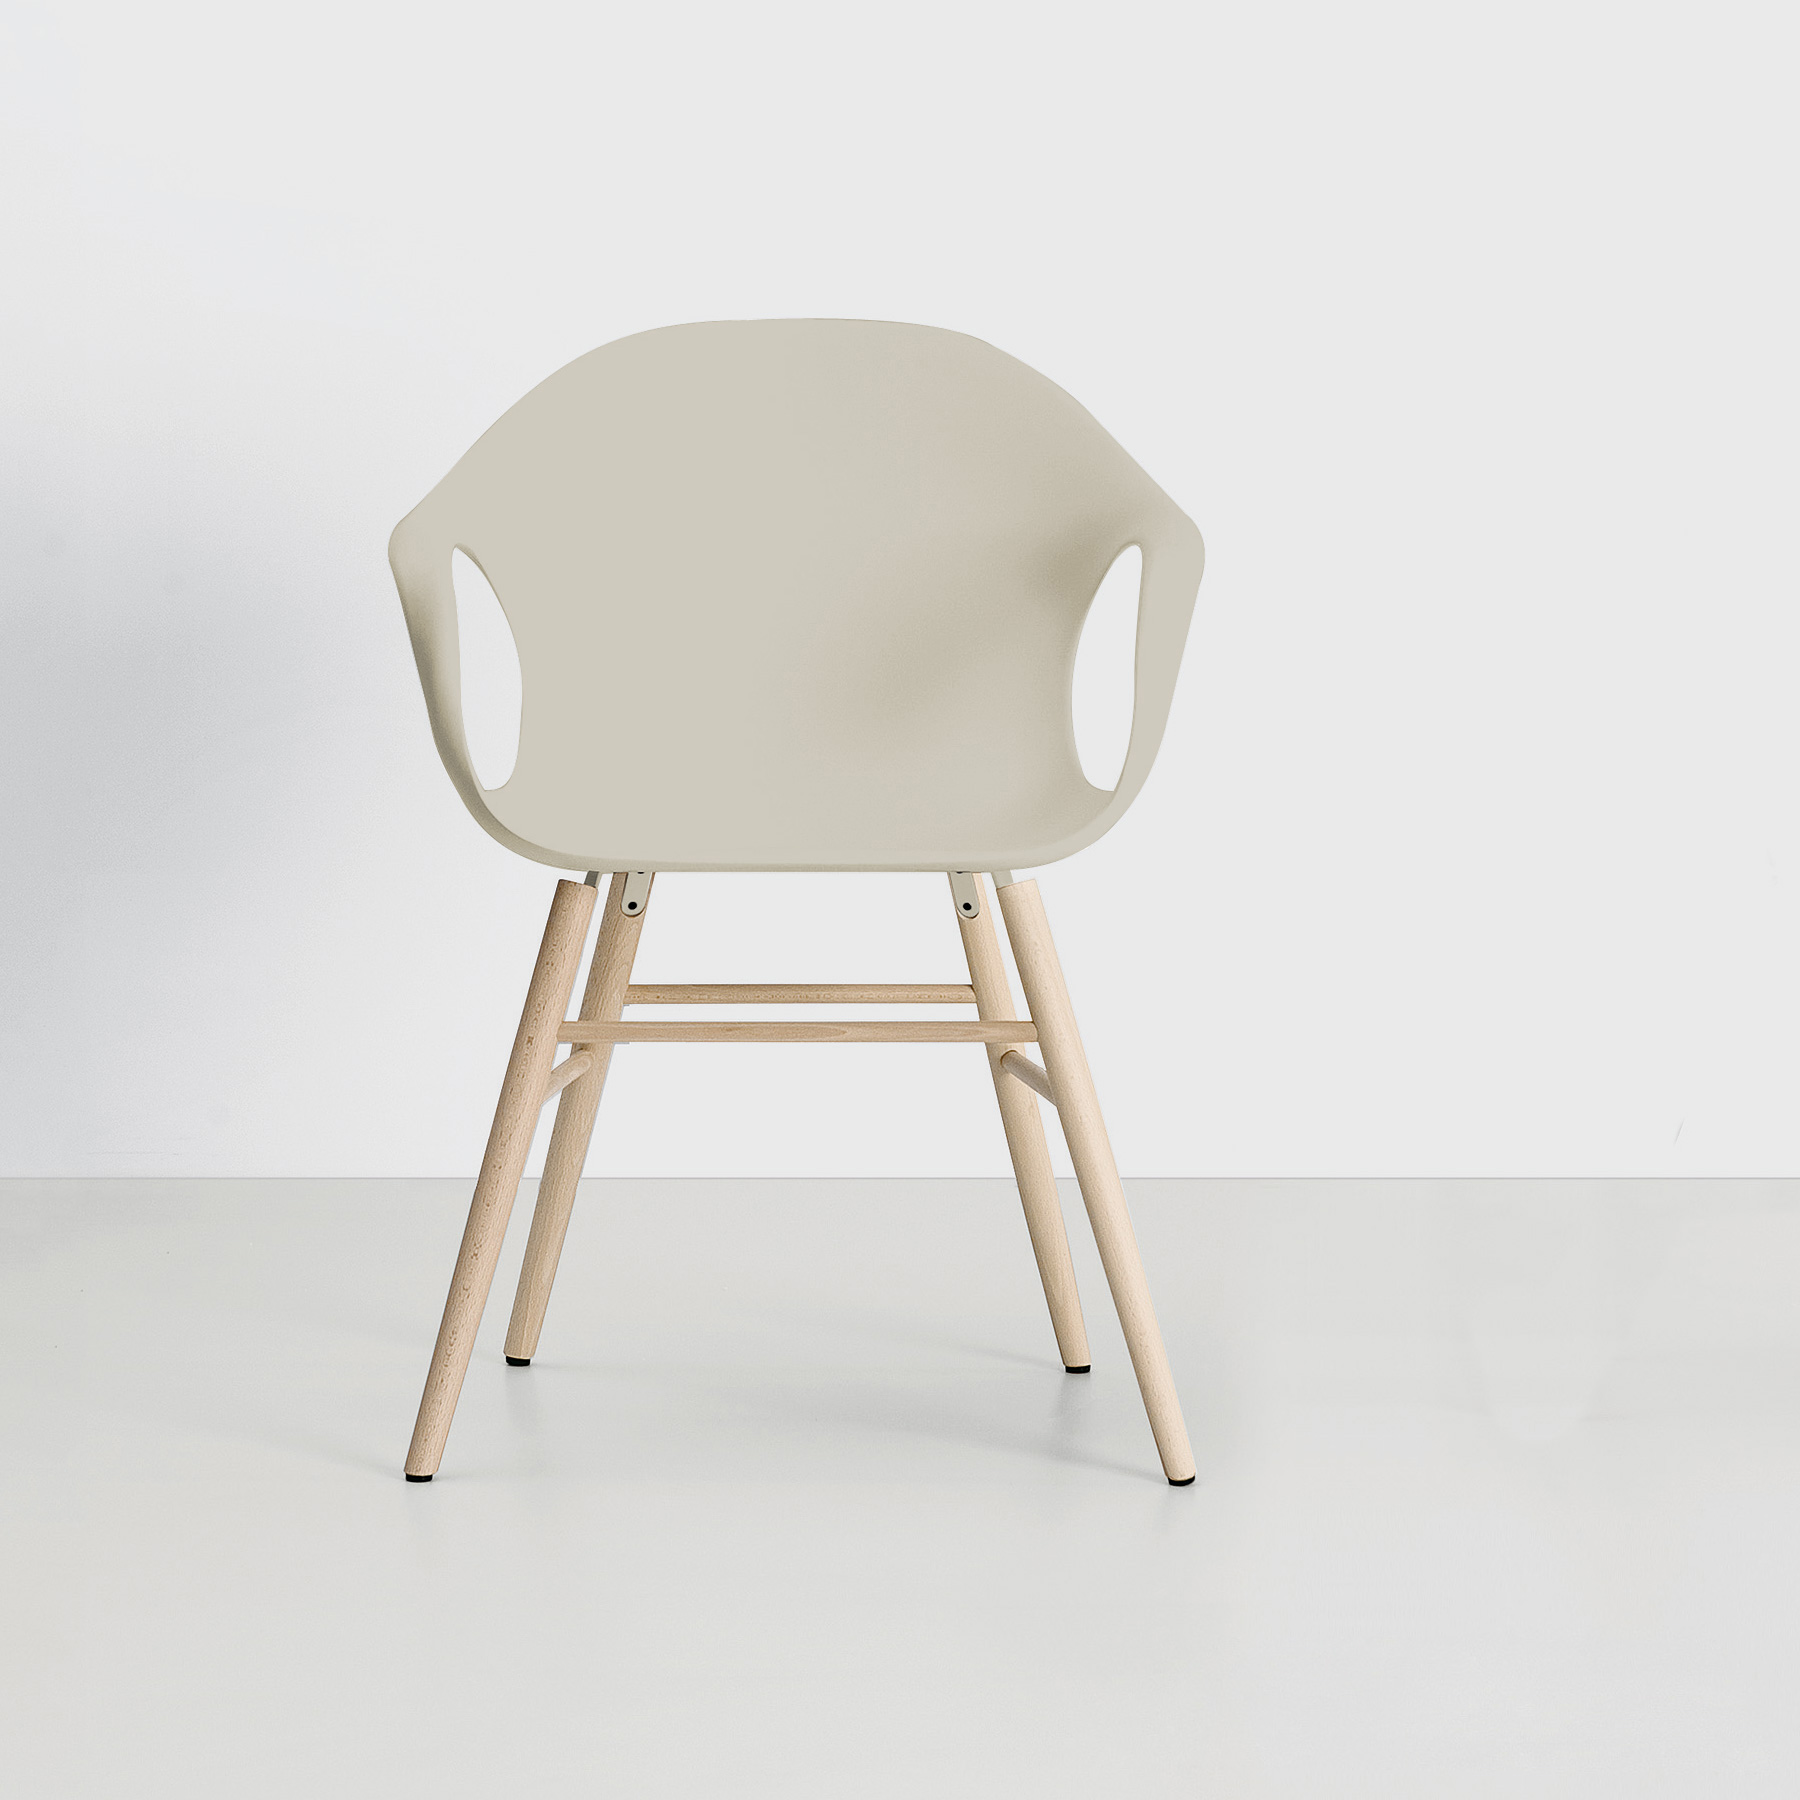 kristalia elephant sessel auf holzbeinen 05ele82p04. Black Bedroom Furniture Sets. Home Design Ideas